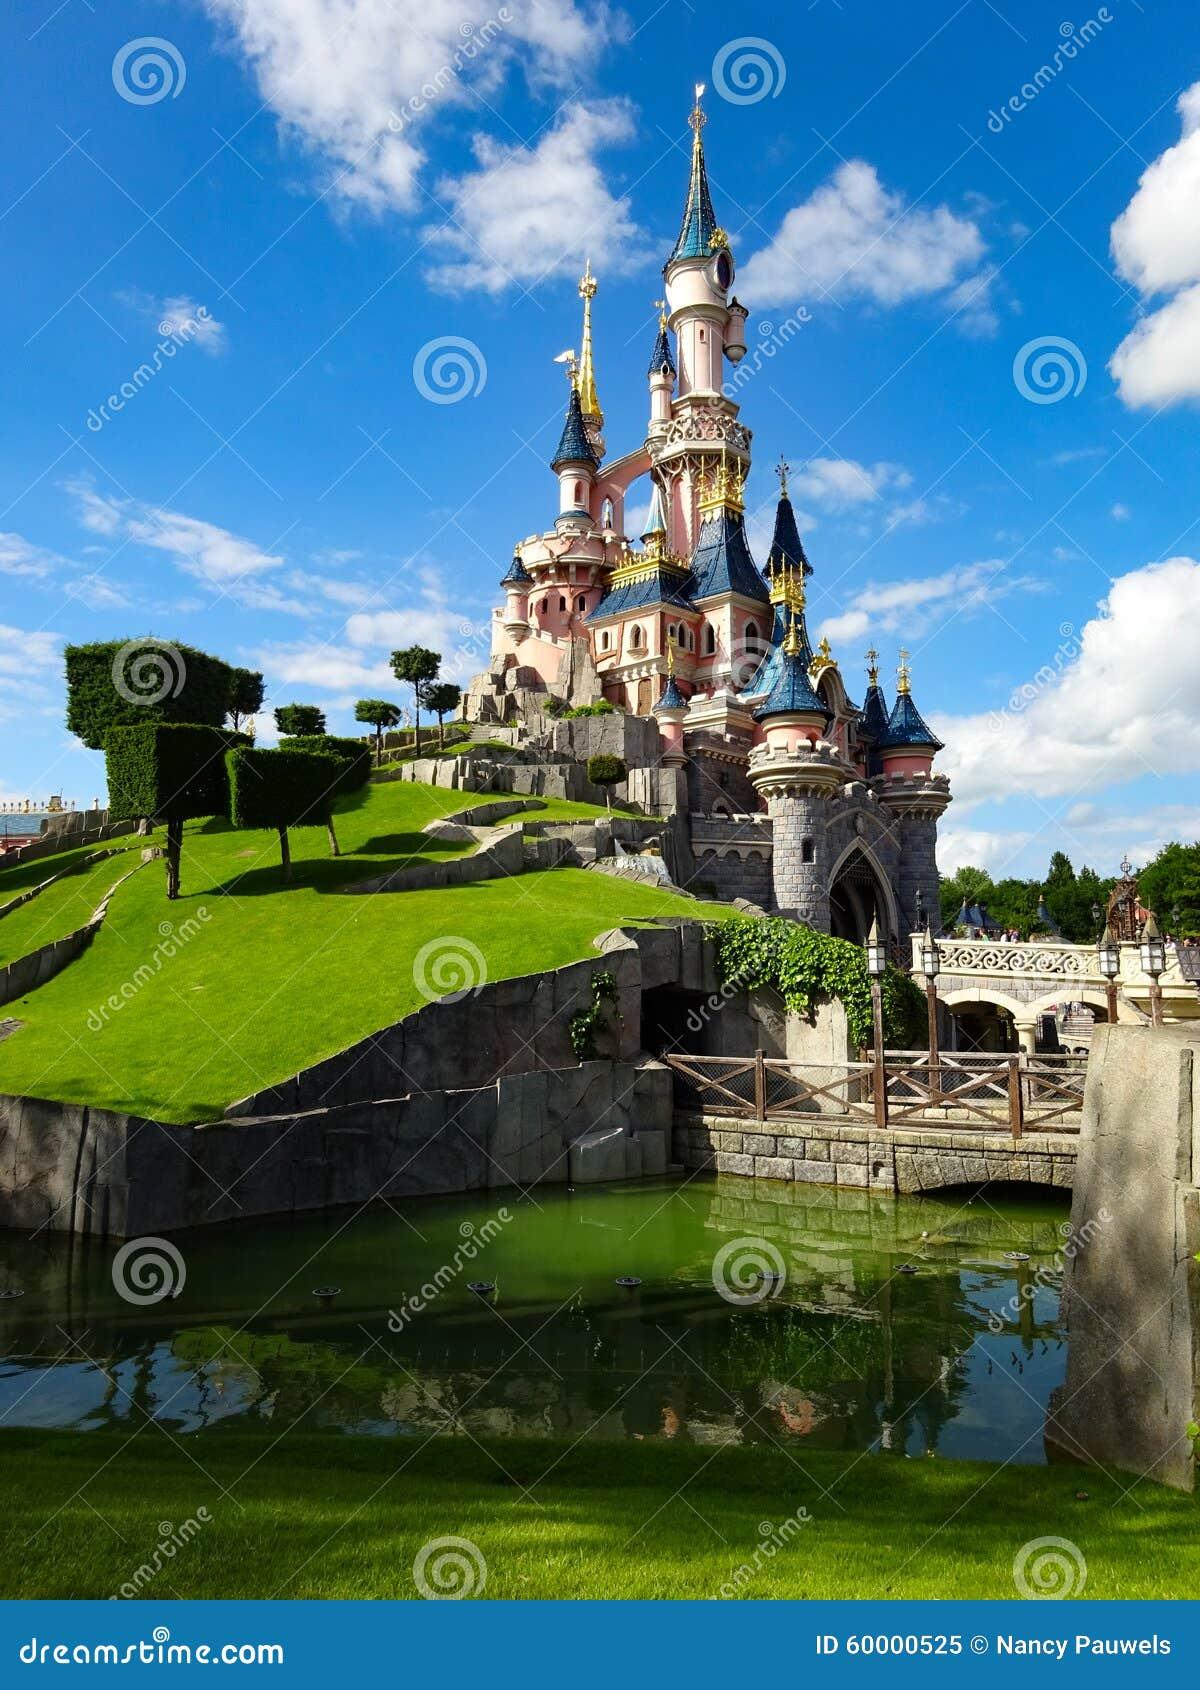 Maj 24th 2015: Disneyland Paris slott